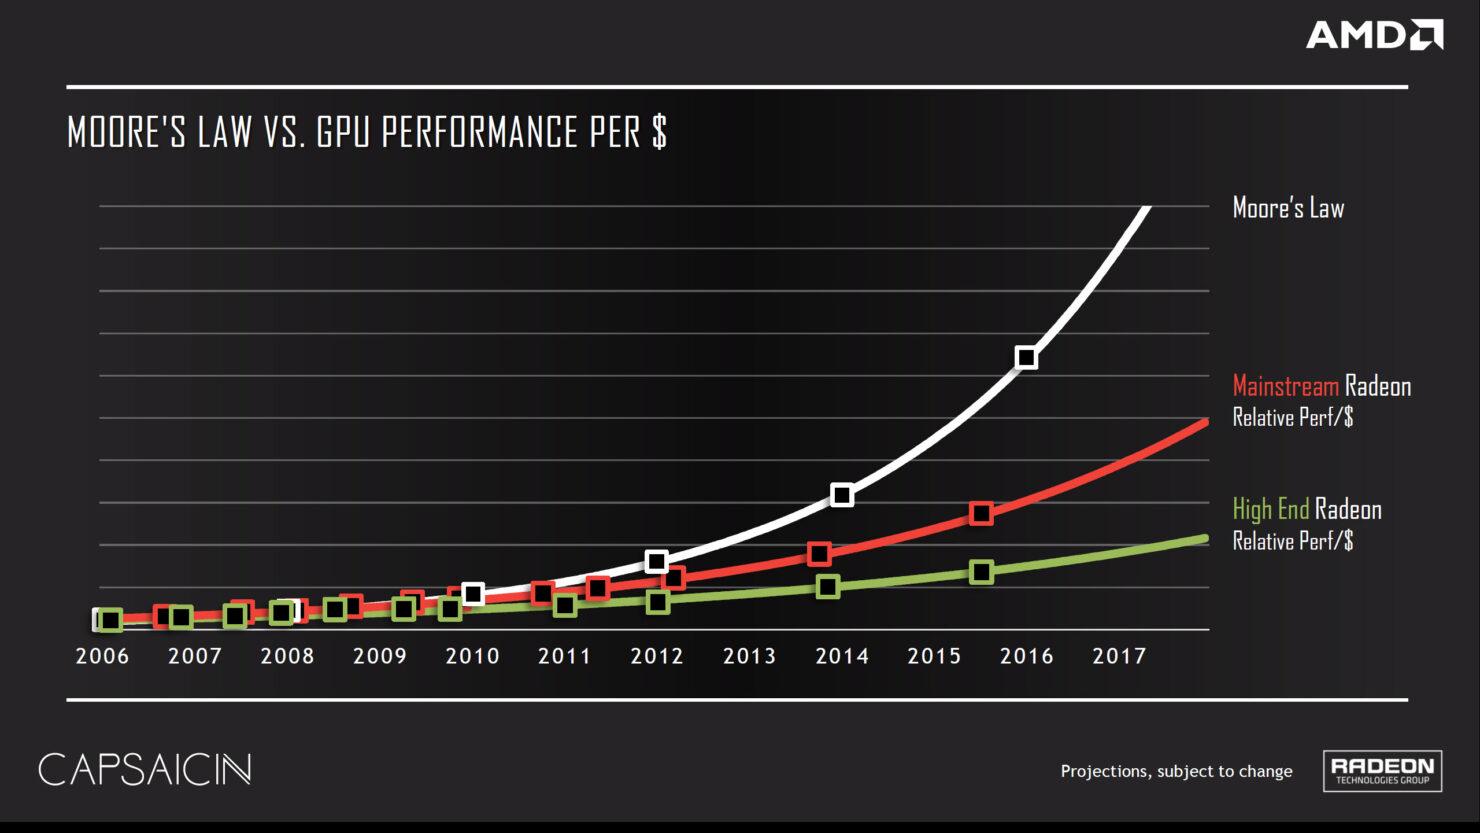 amd-performance-per-dollar-chart-capsaicin-2016